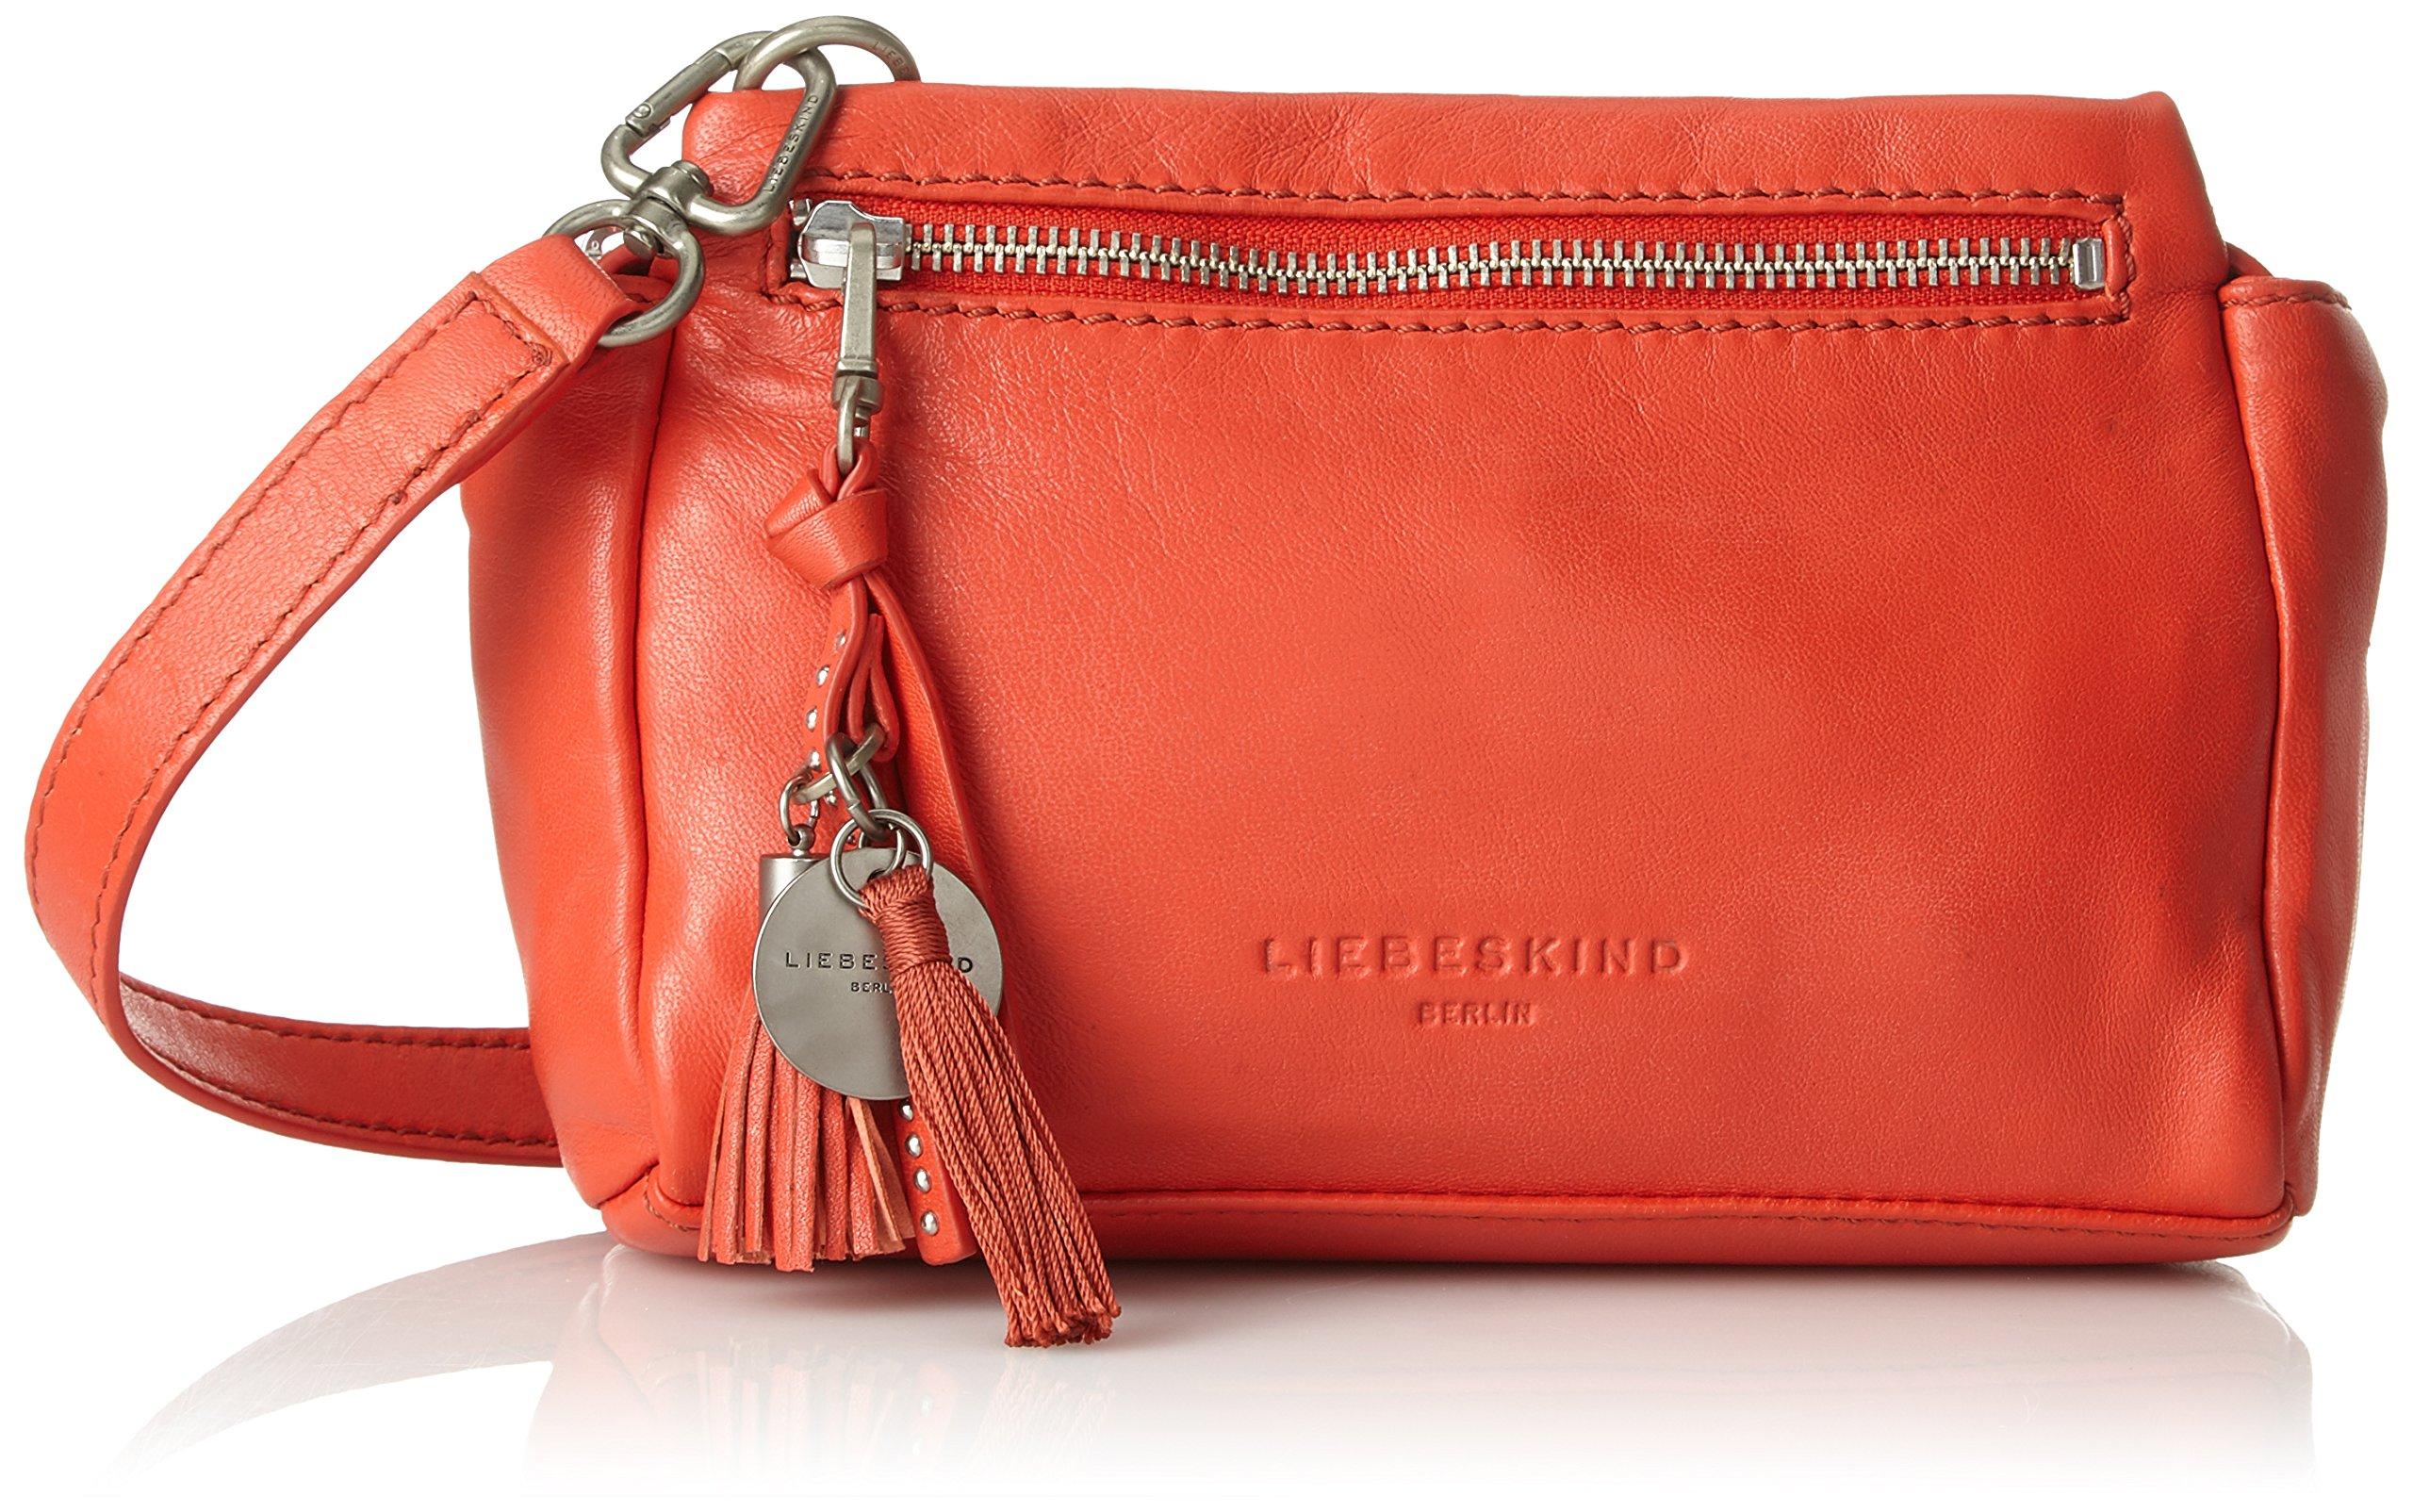 Liebeskind Berlin - Corinto Mamoun, Women's Bag Organiser, Red (Hibiscus), 7x9x14 cm (B x H x T) by Liebeskind Berlin